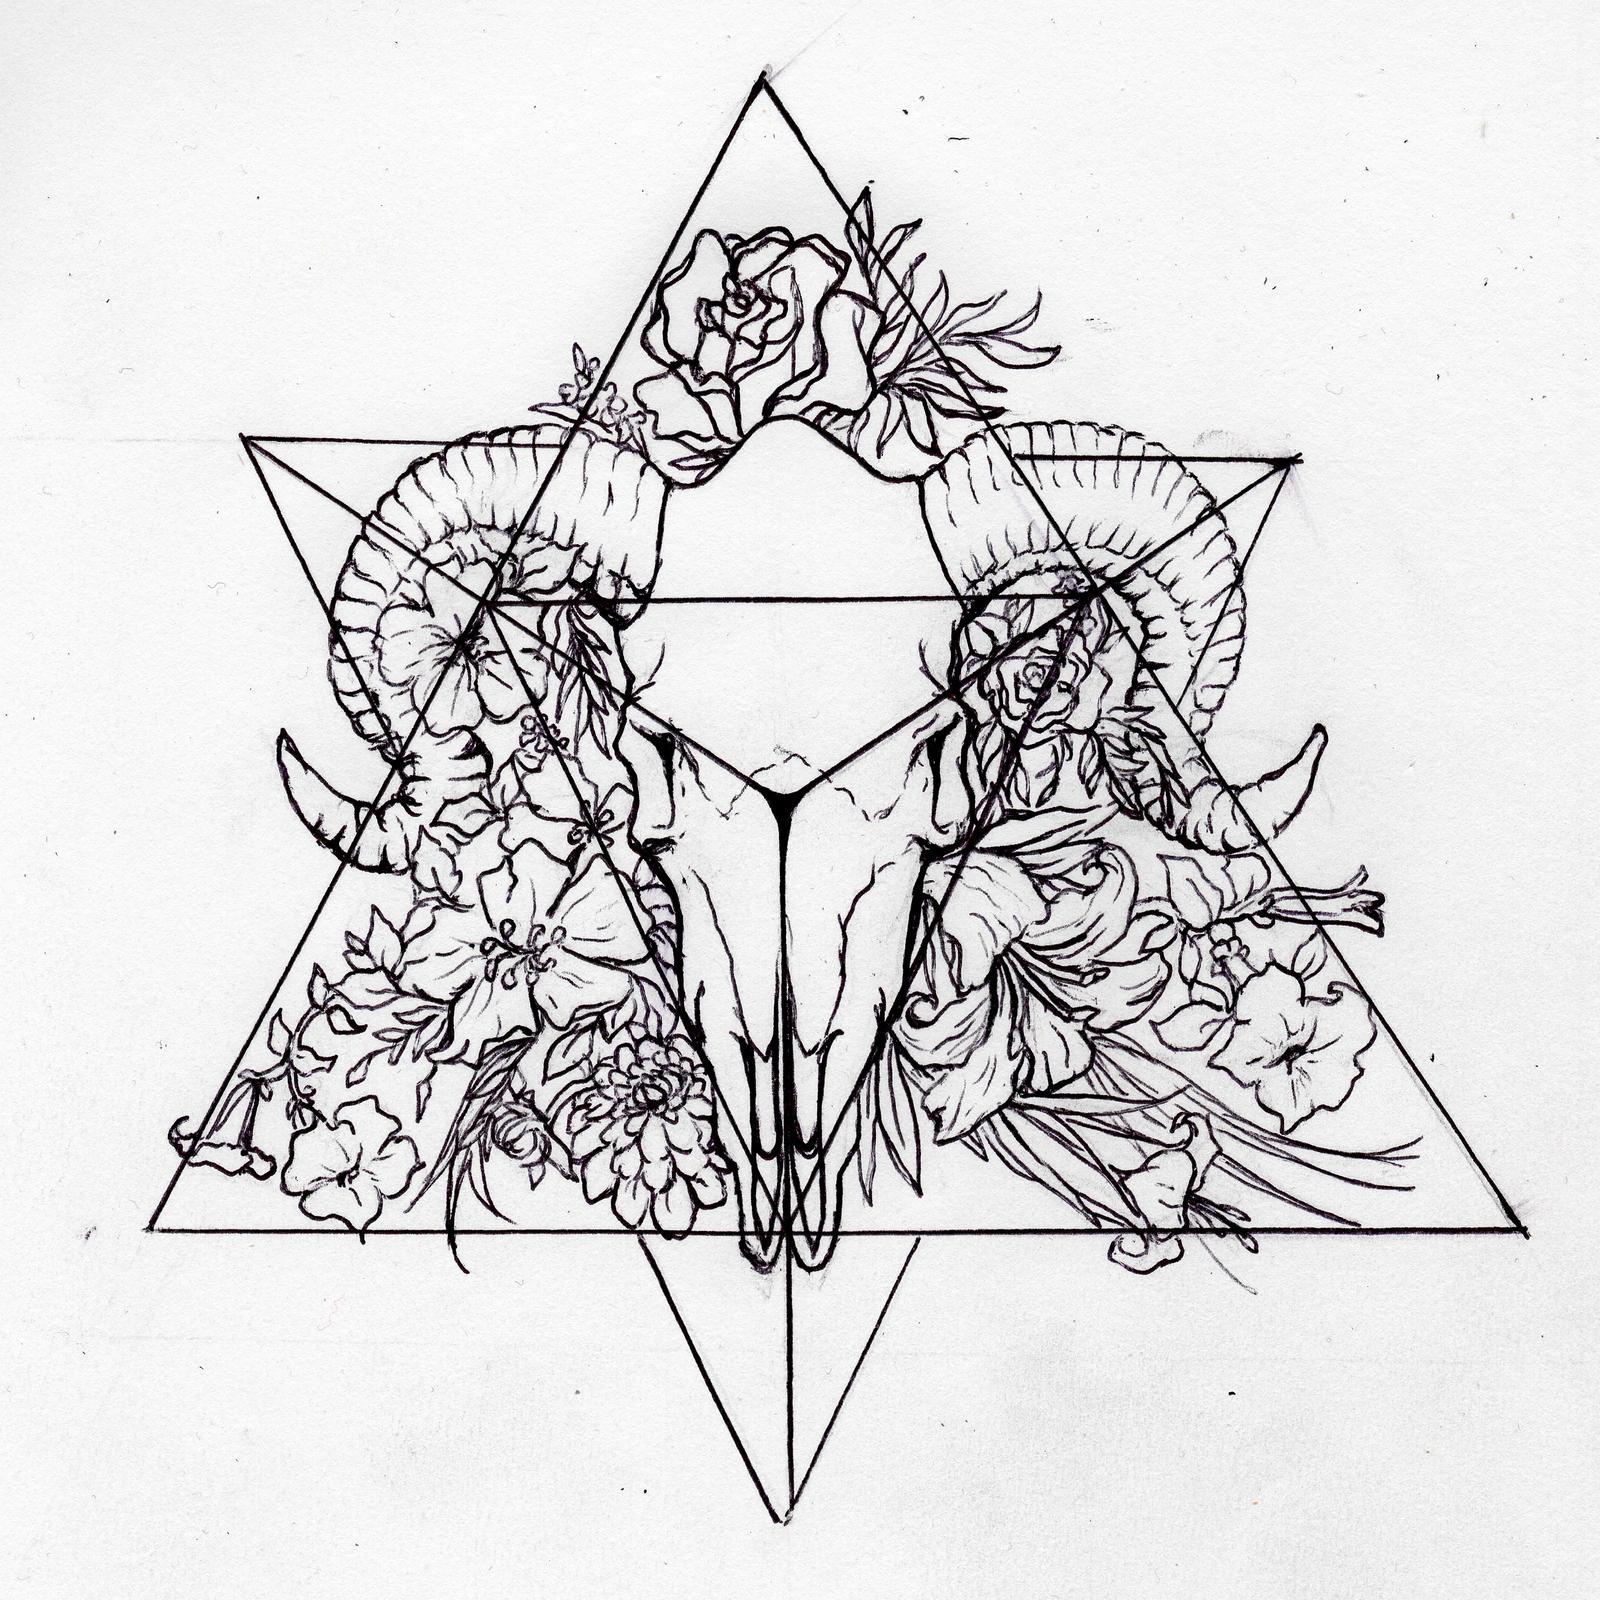 Tetrahedron Personal Tattoo Design By Morgan96k On Deviantart